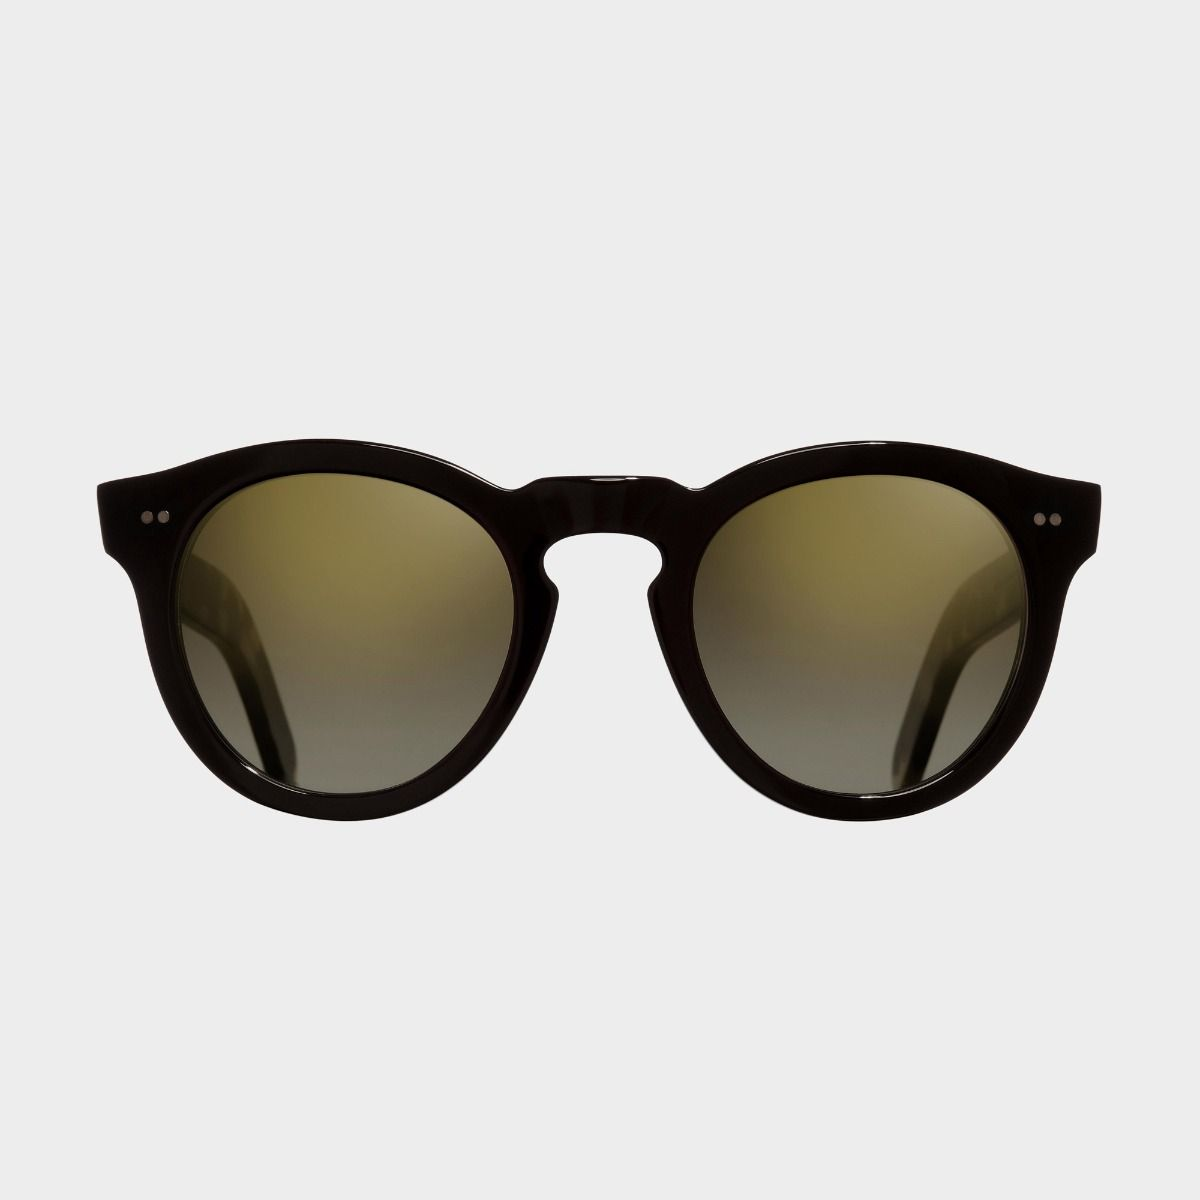 0734 Round Sunglasses (Large)-Black on Camo